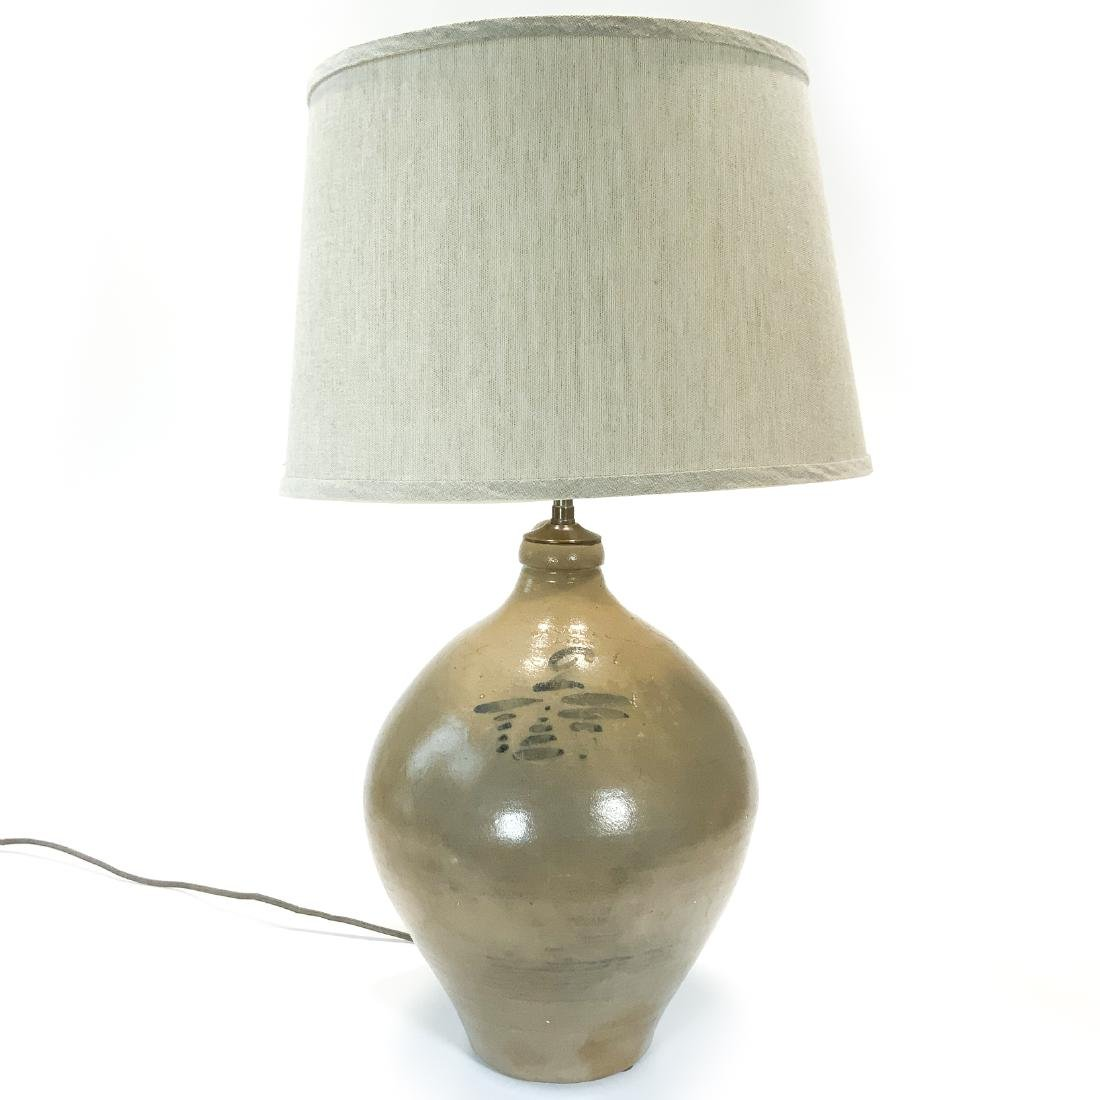 Antique 2 Gallon Clarke Lyon Stoneware Lamp c1830